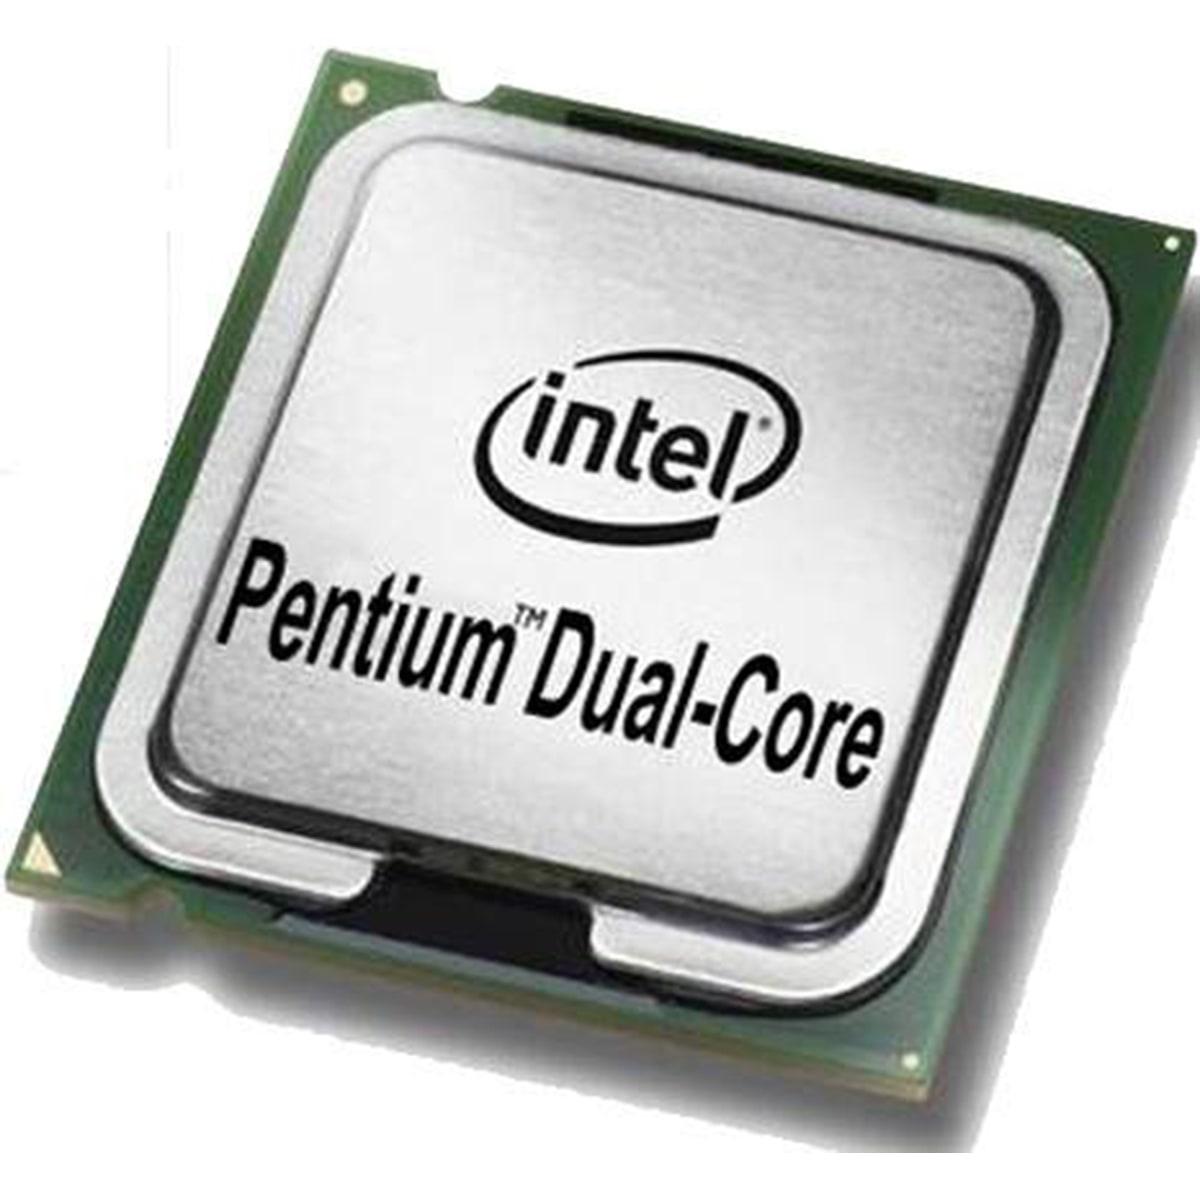 Processador Intel Dual Core E5500 2,80Ghz 2M Cache 800 MHz Socket 775 - Seminovo